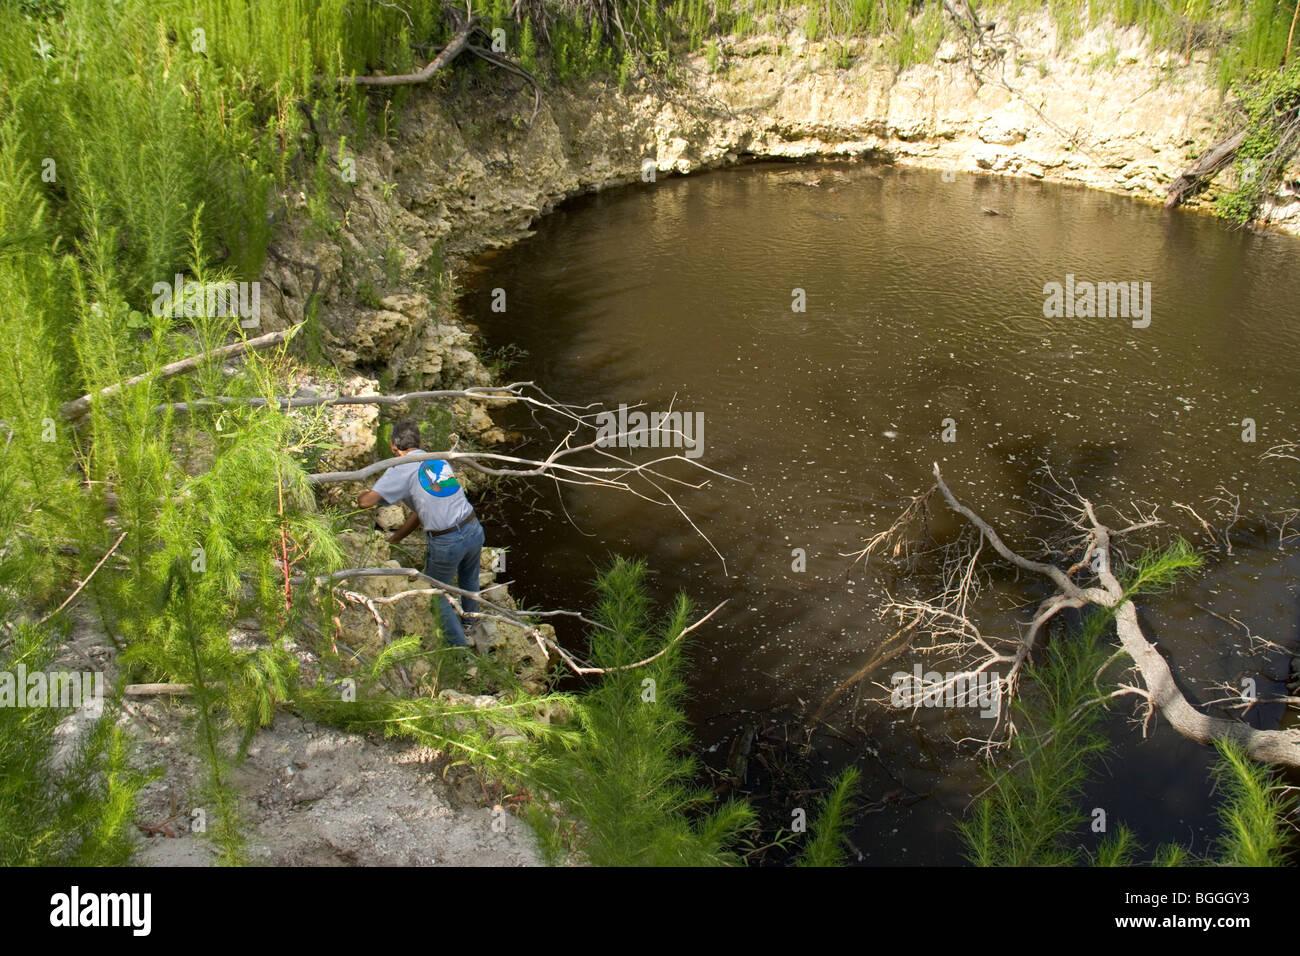 Sinkhole Florida Stock Photos Amp Sinkhole Florida Stock